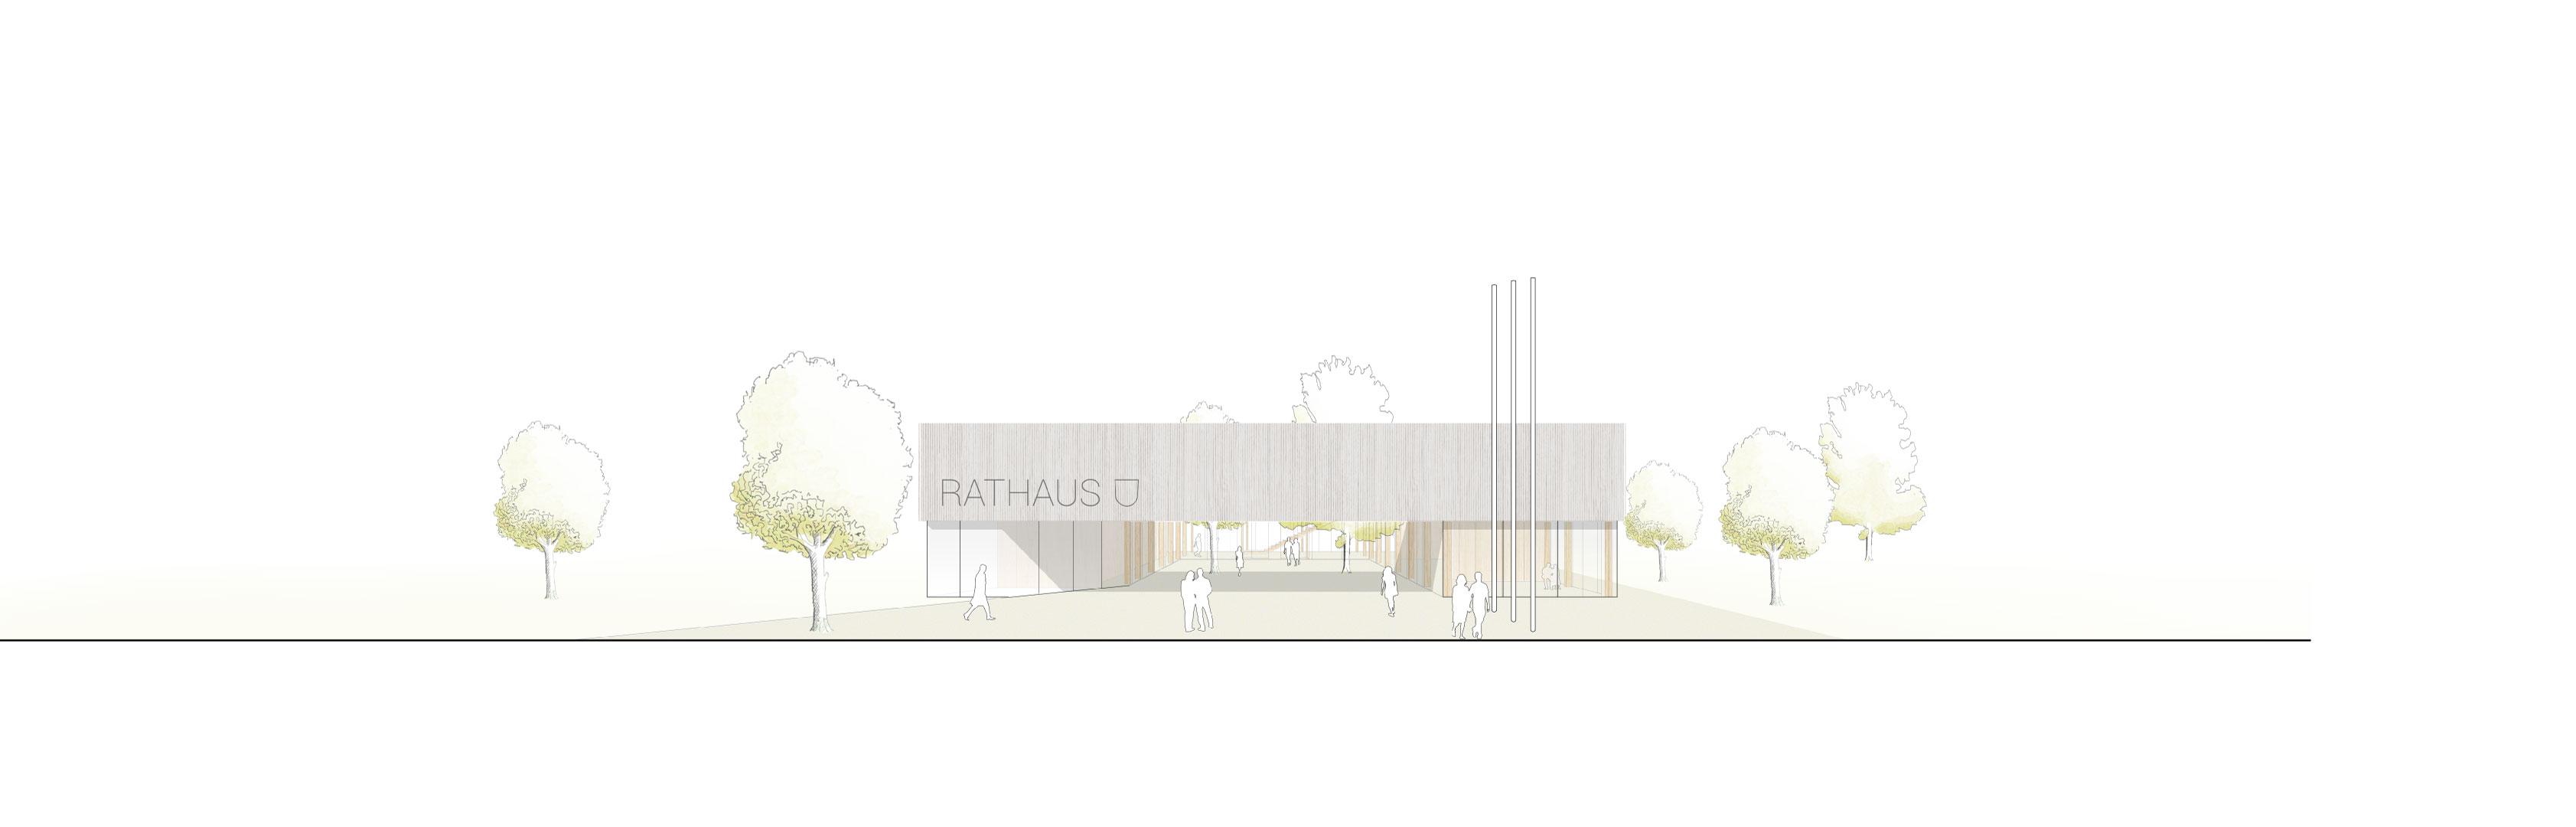 STUDIOKUBIK-KUBIK-architektur-architecture-berlin-RMP-skizze-ansicht-2-elevation-2